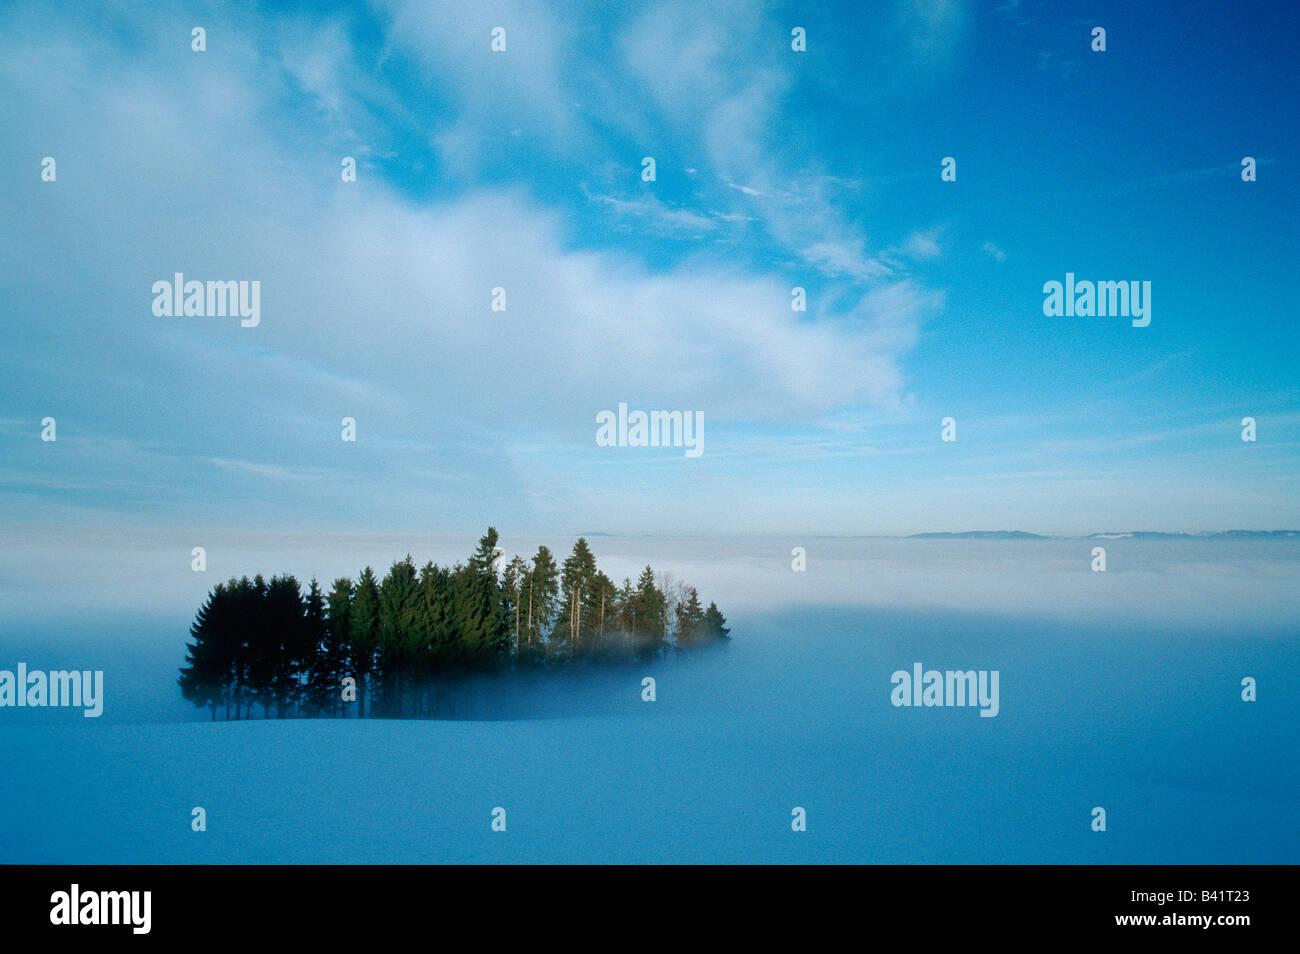 Wald im Winternebel geschreddert Schweiz Stockbild